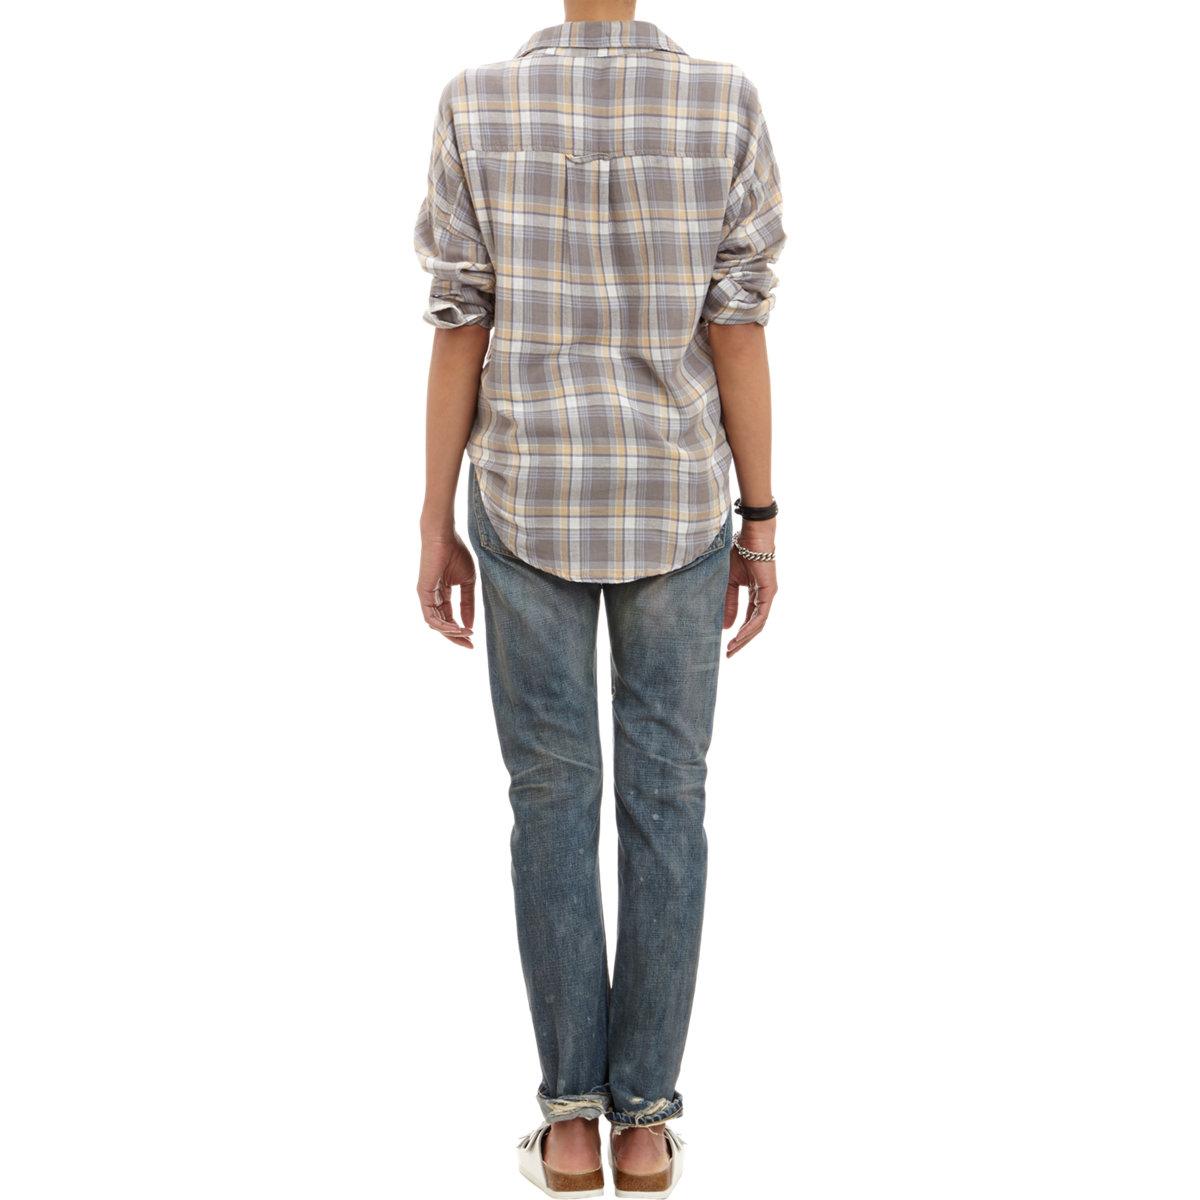 Nsf clothing plaid flannel shirt in gray lyst for Grey plaid shirt womens